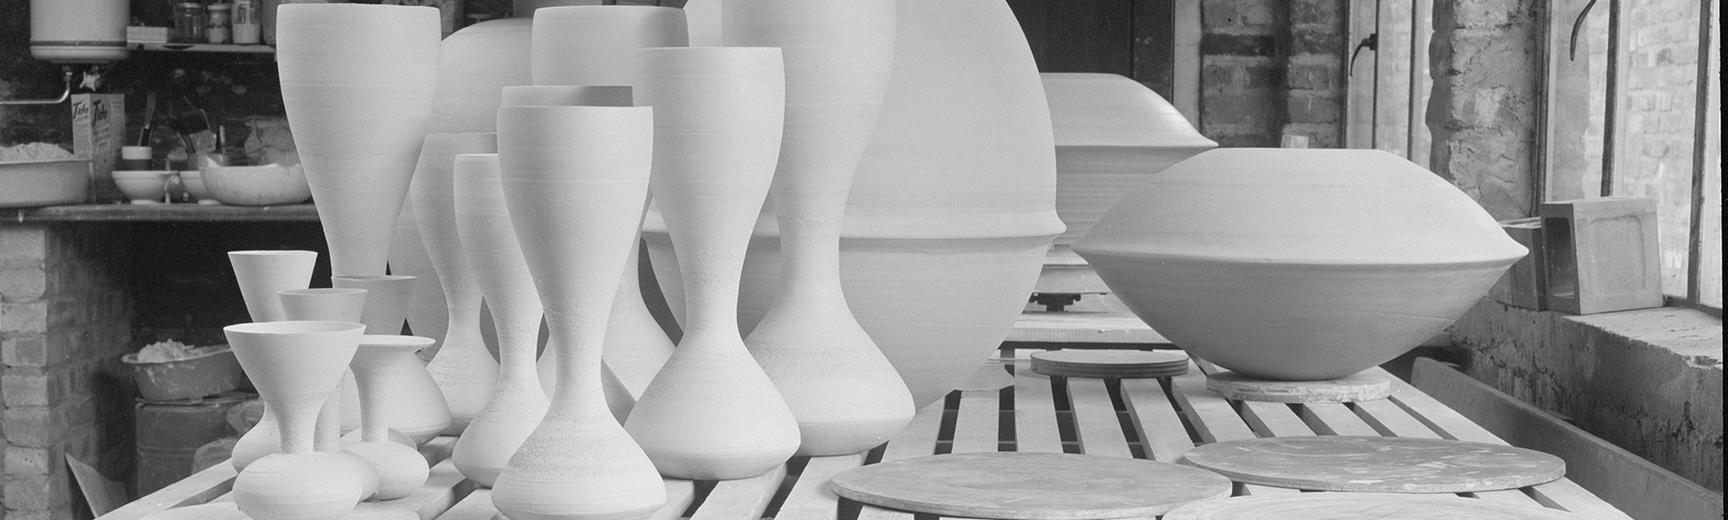 Ceramic vessels by Hans Coper © Jane Coper and Estate of the Artist